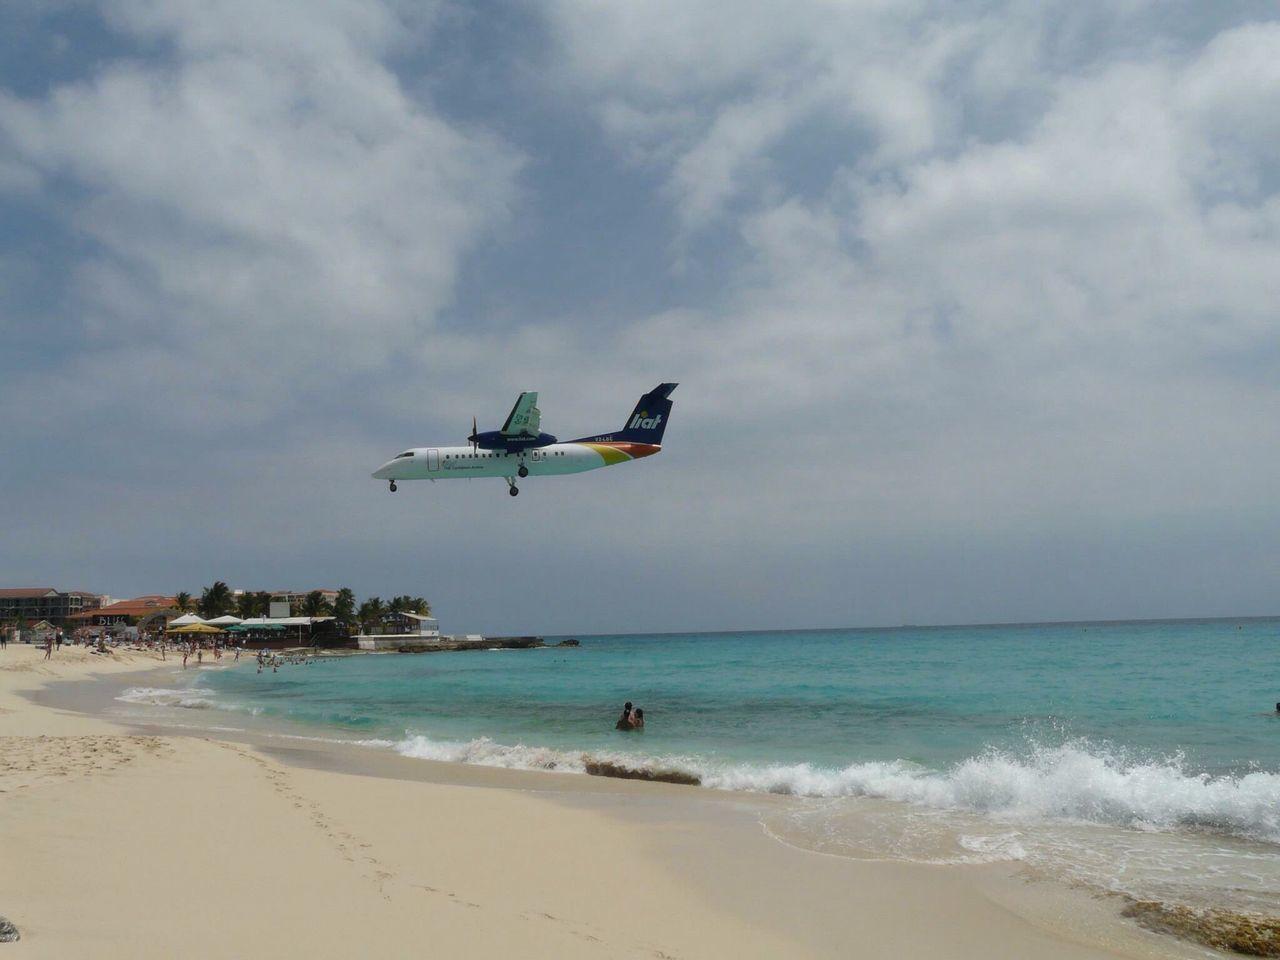 AirPlane ✈ Airport Beach Landing Beach St. Maarten Carribean